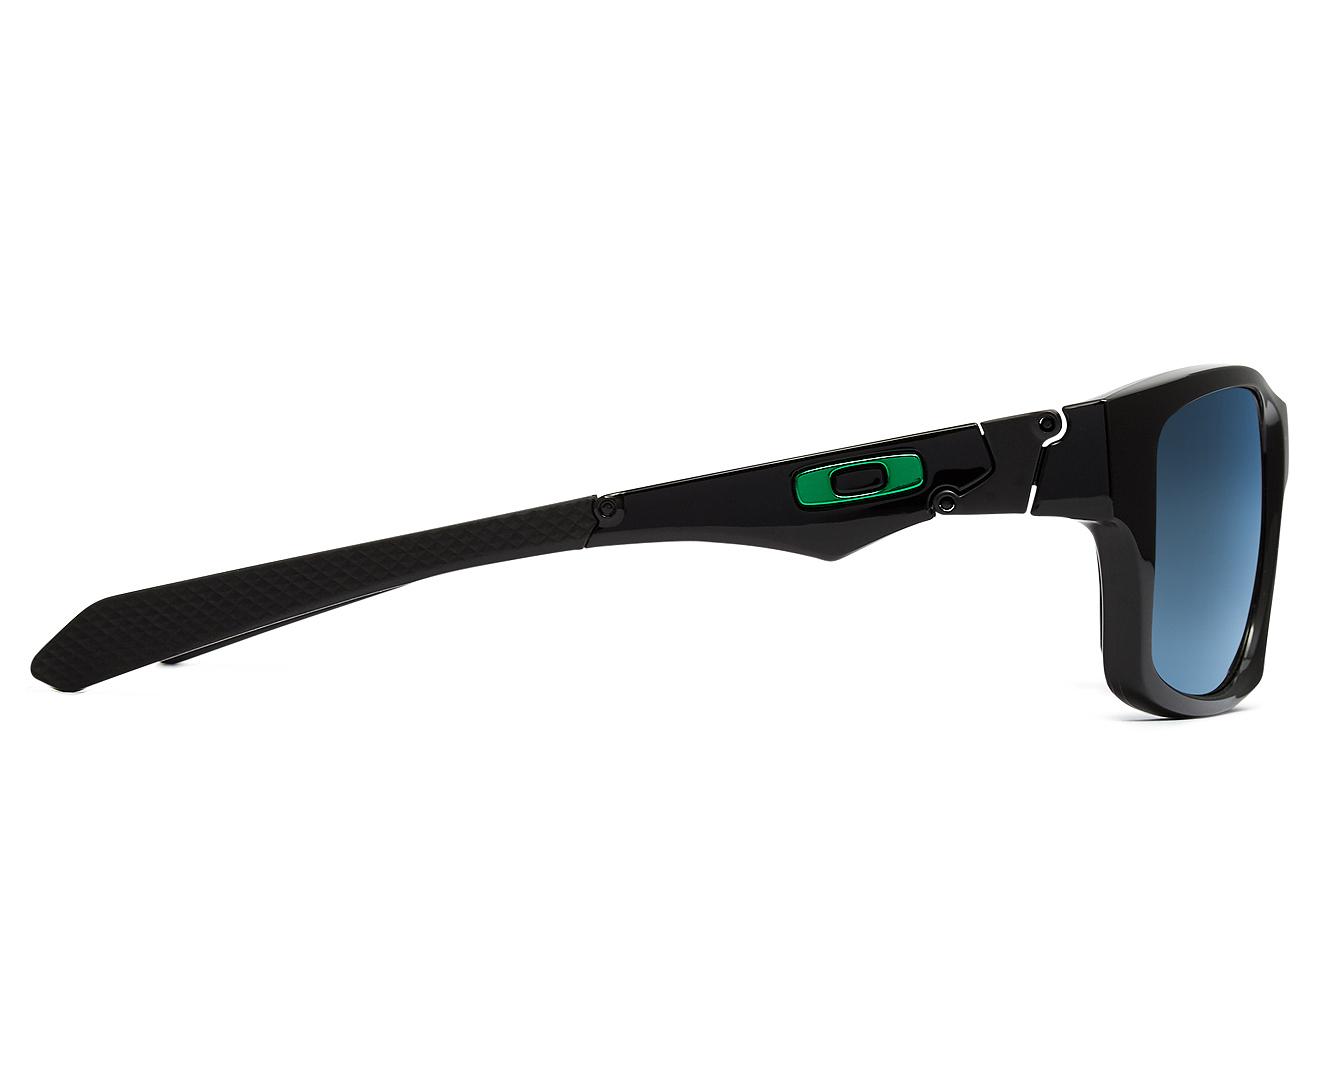 38fc9e05a62 Oakley Men s Jupiter Squared Sunglasses - Polished Black Jade Iridium